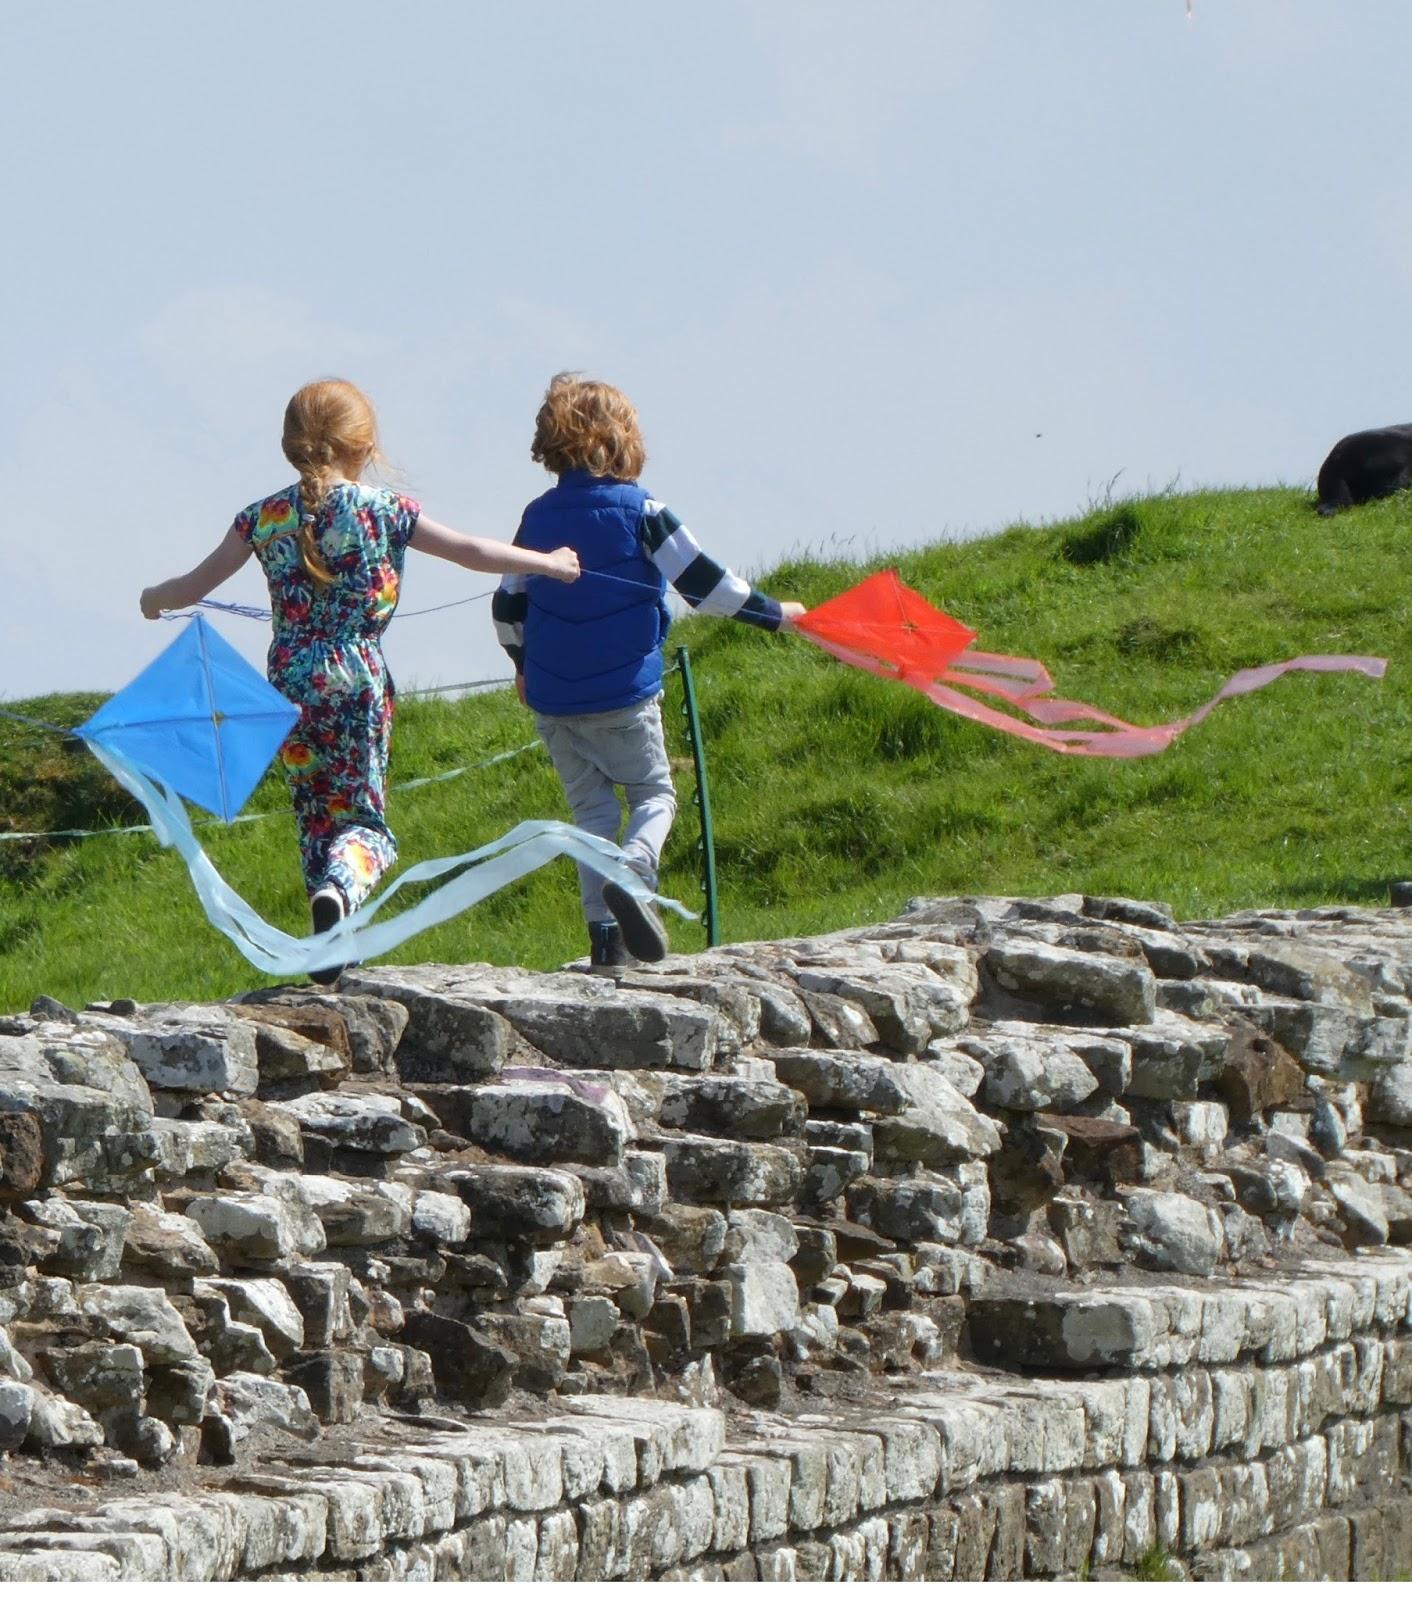 Hadrian's Wall Kite Festival 2016 - Birdoswald Roman Fort